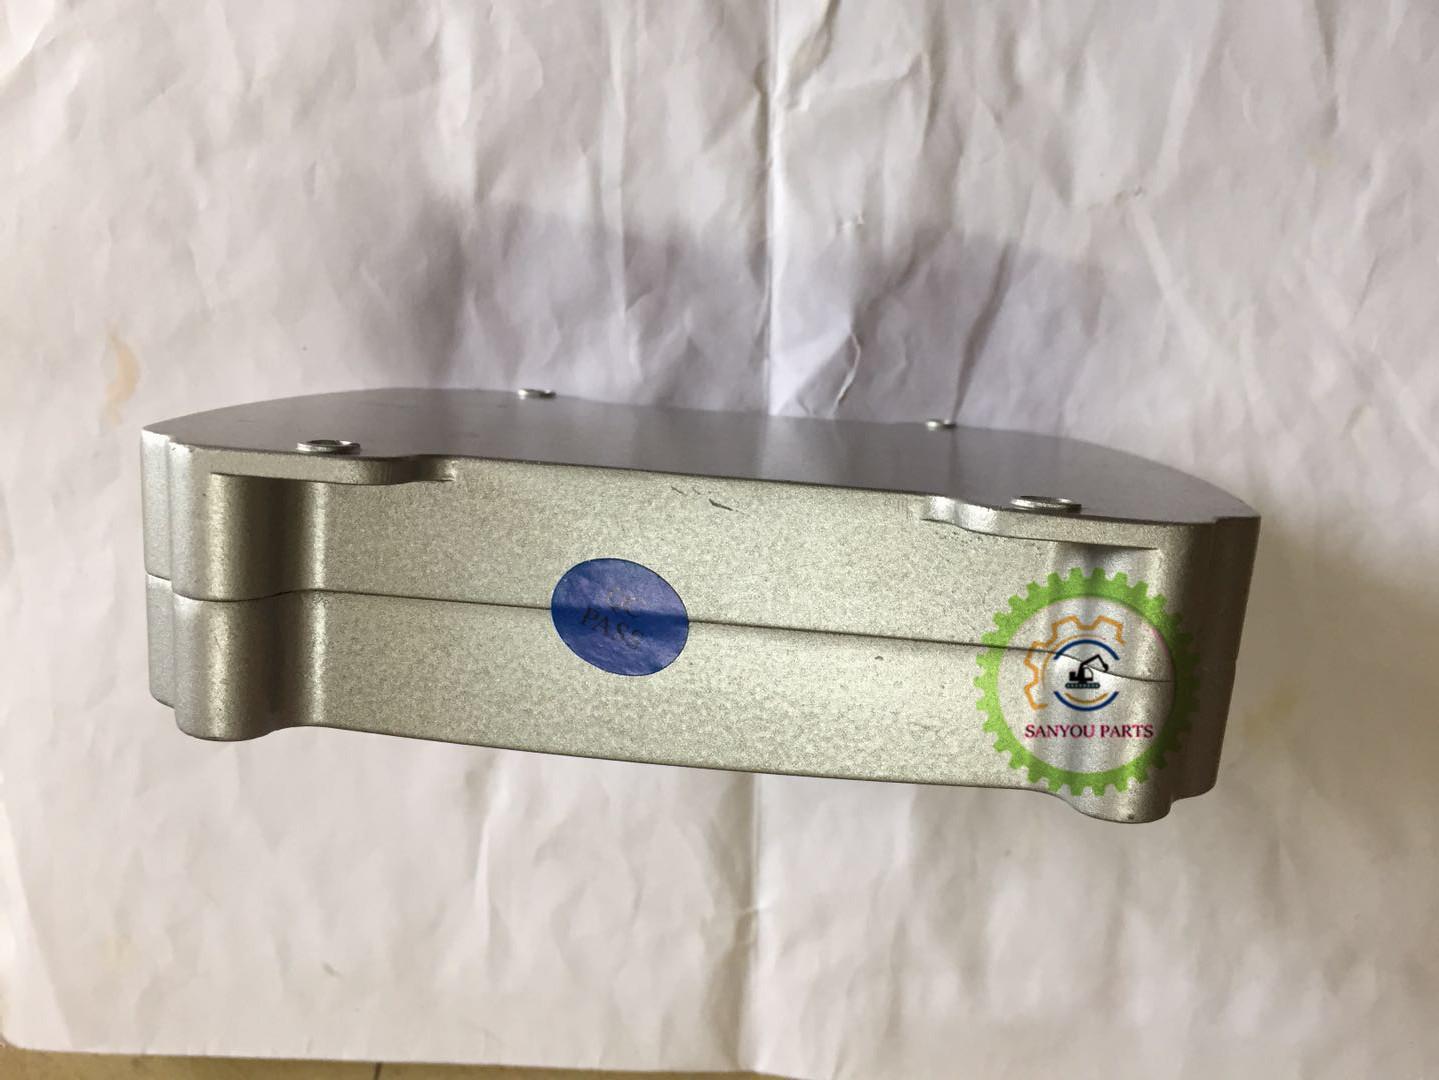 20180529142919 副本 - ECU-2000 Zoomlion Controller